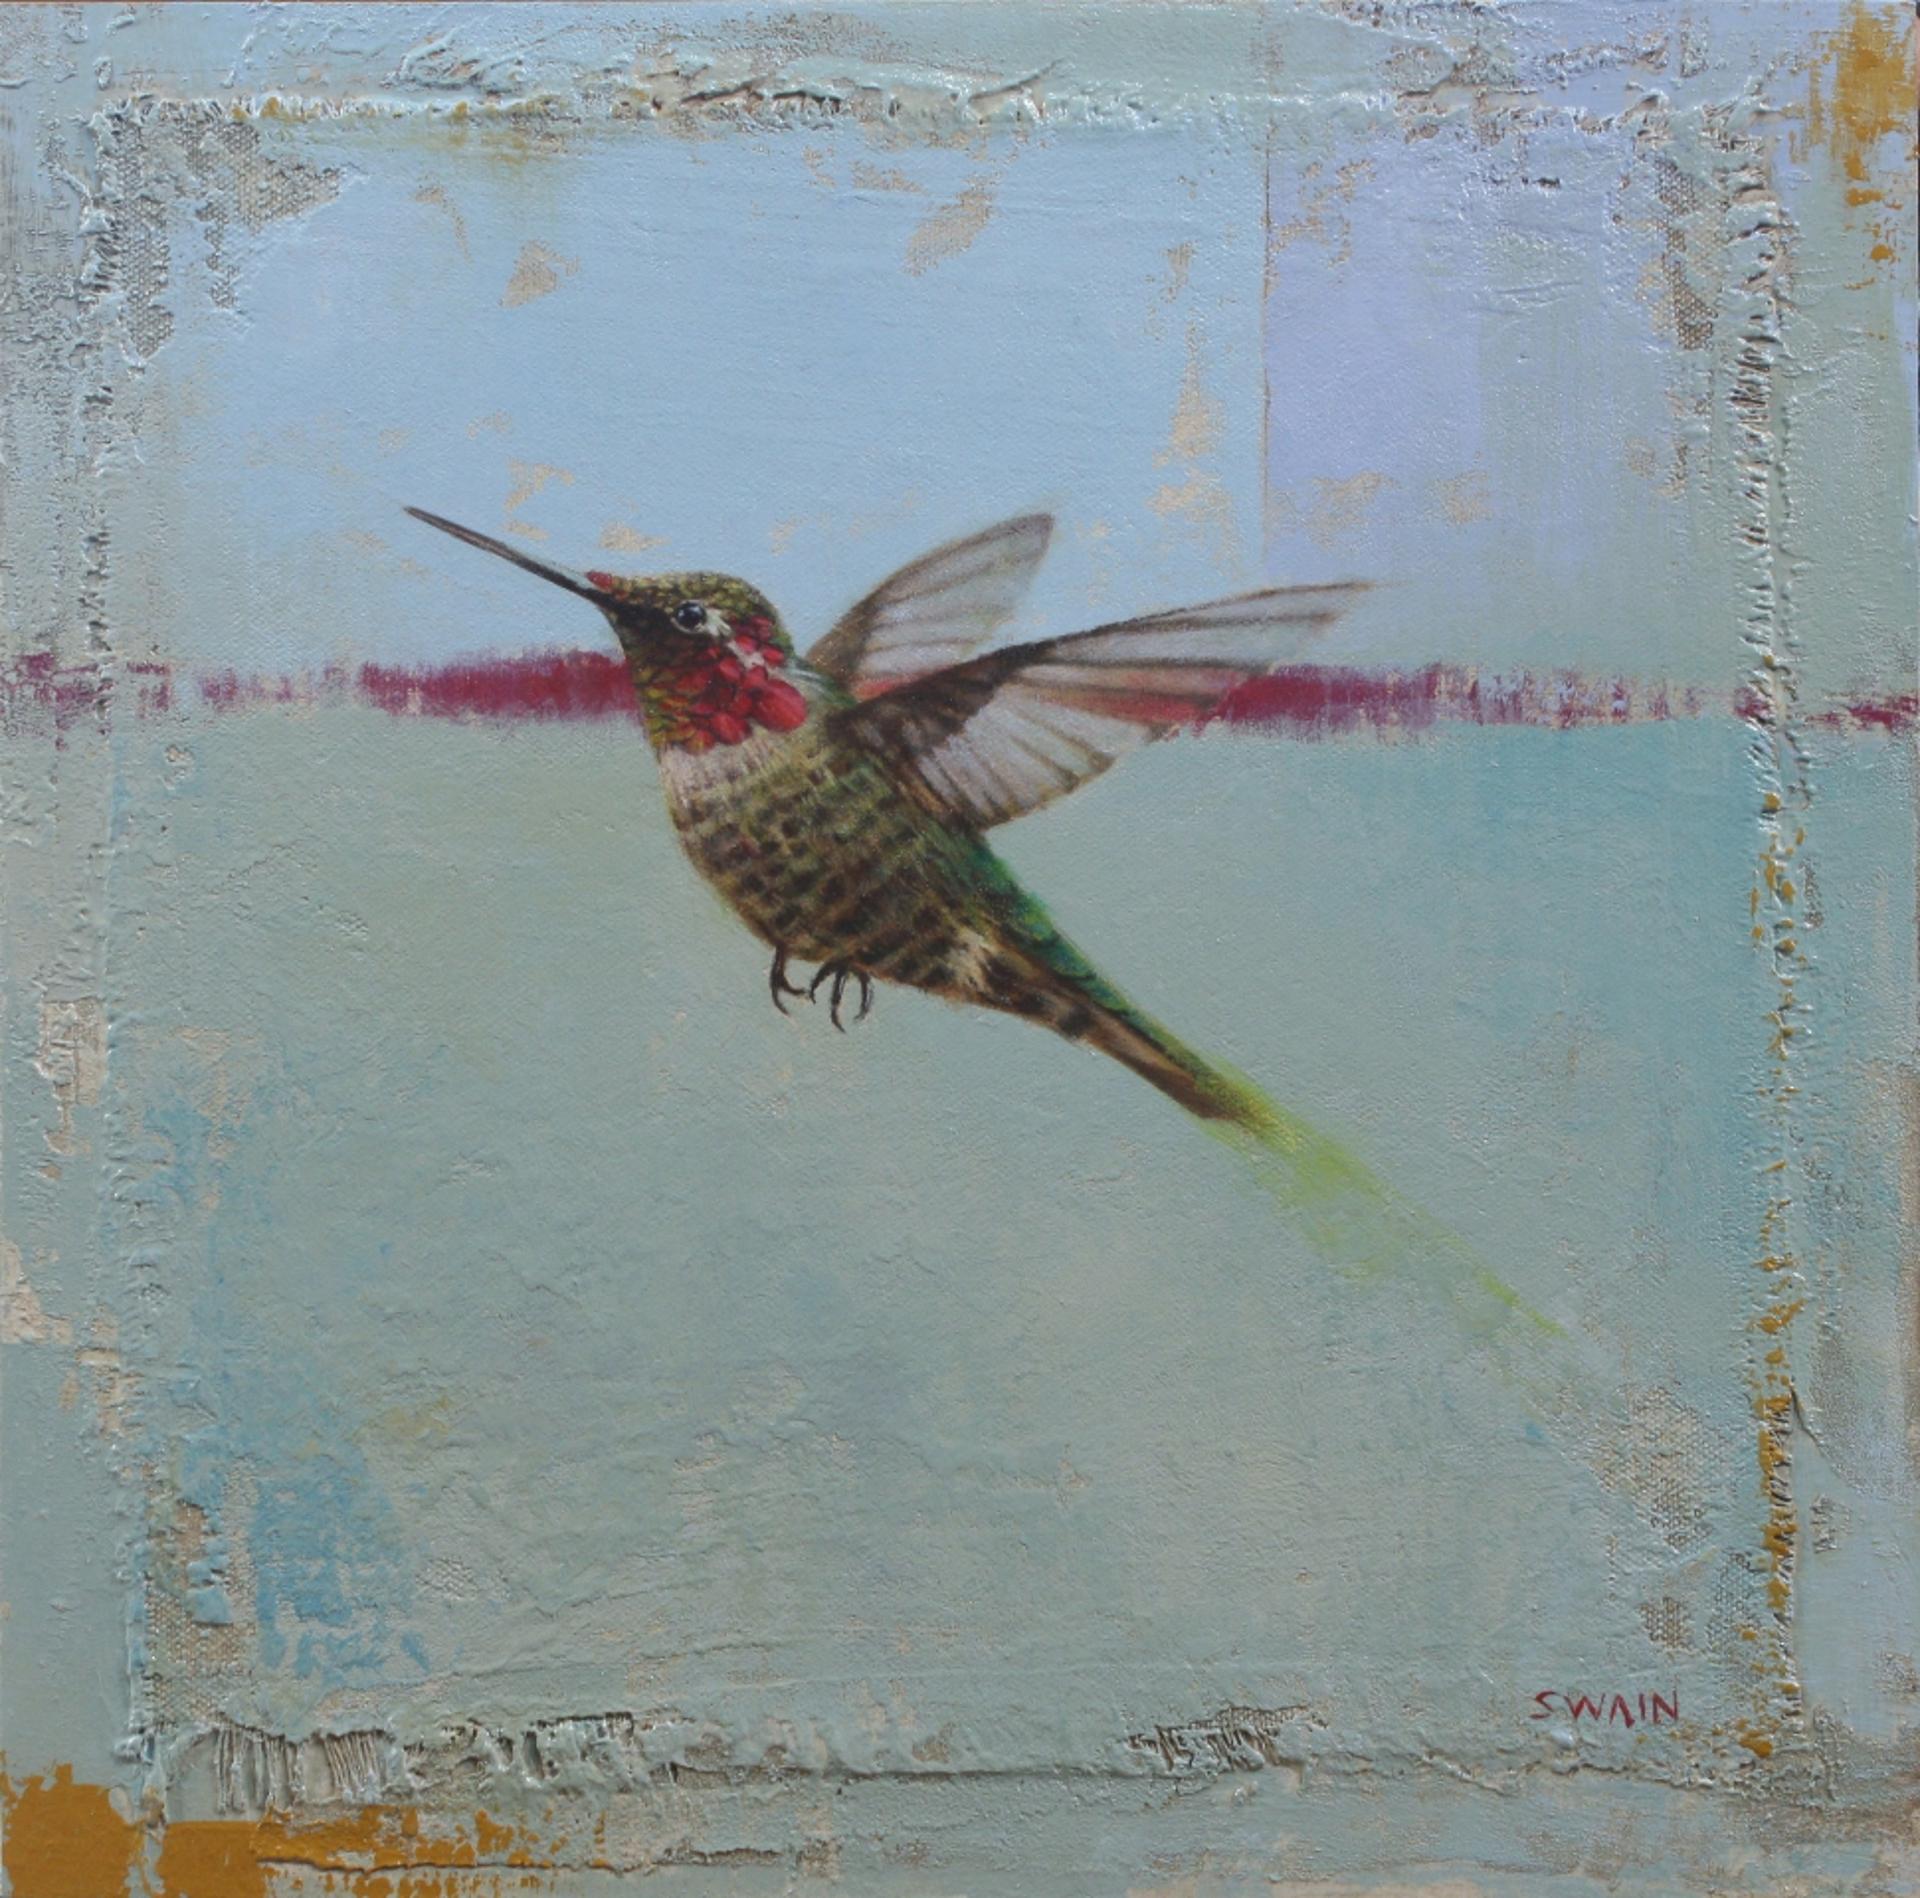 Hummingbird Flight no. 5 by Tyler Swain